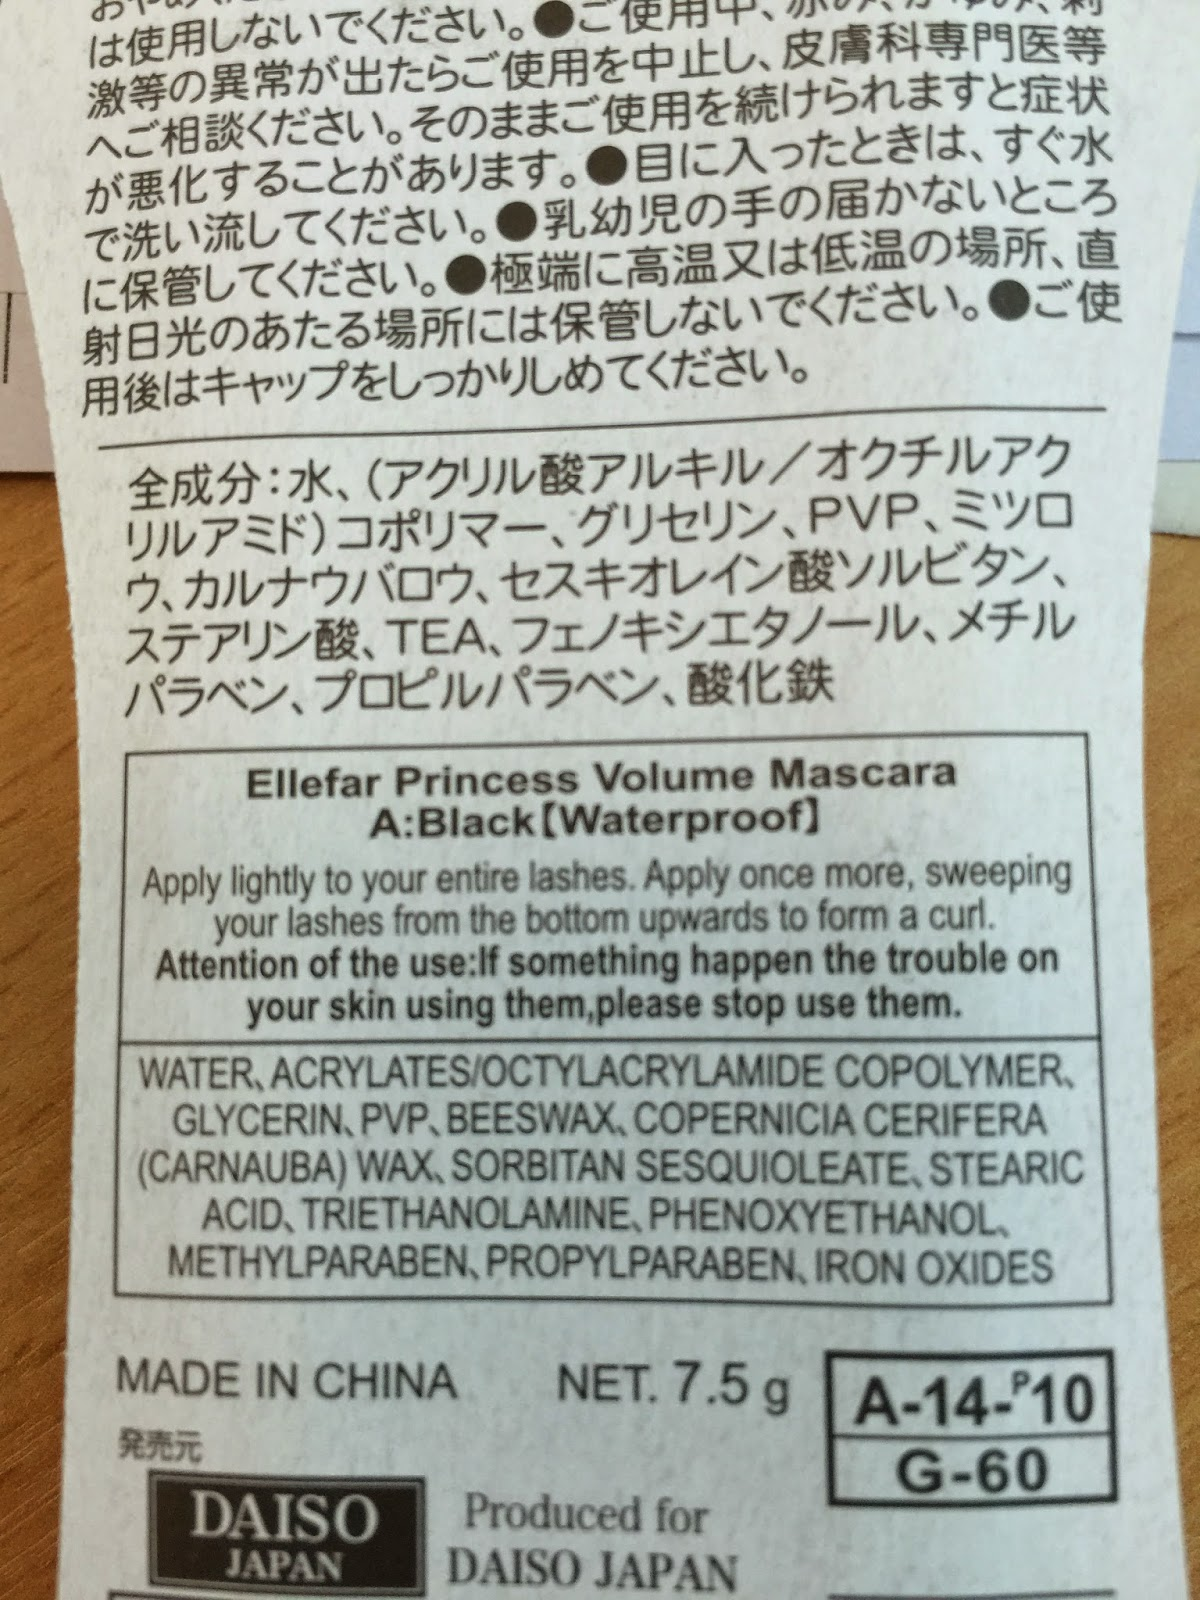 midsummer: Daiso Product #7: Ellefar Waterproof Mascara